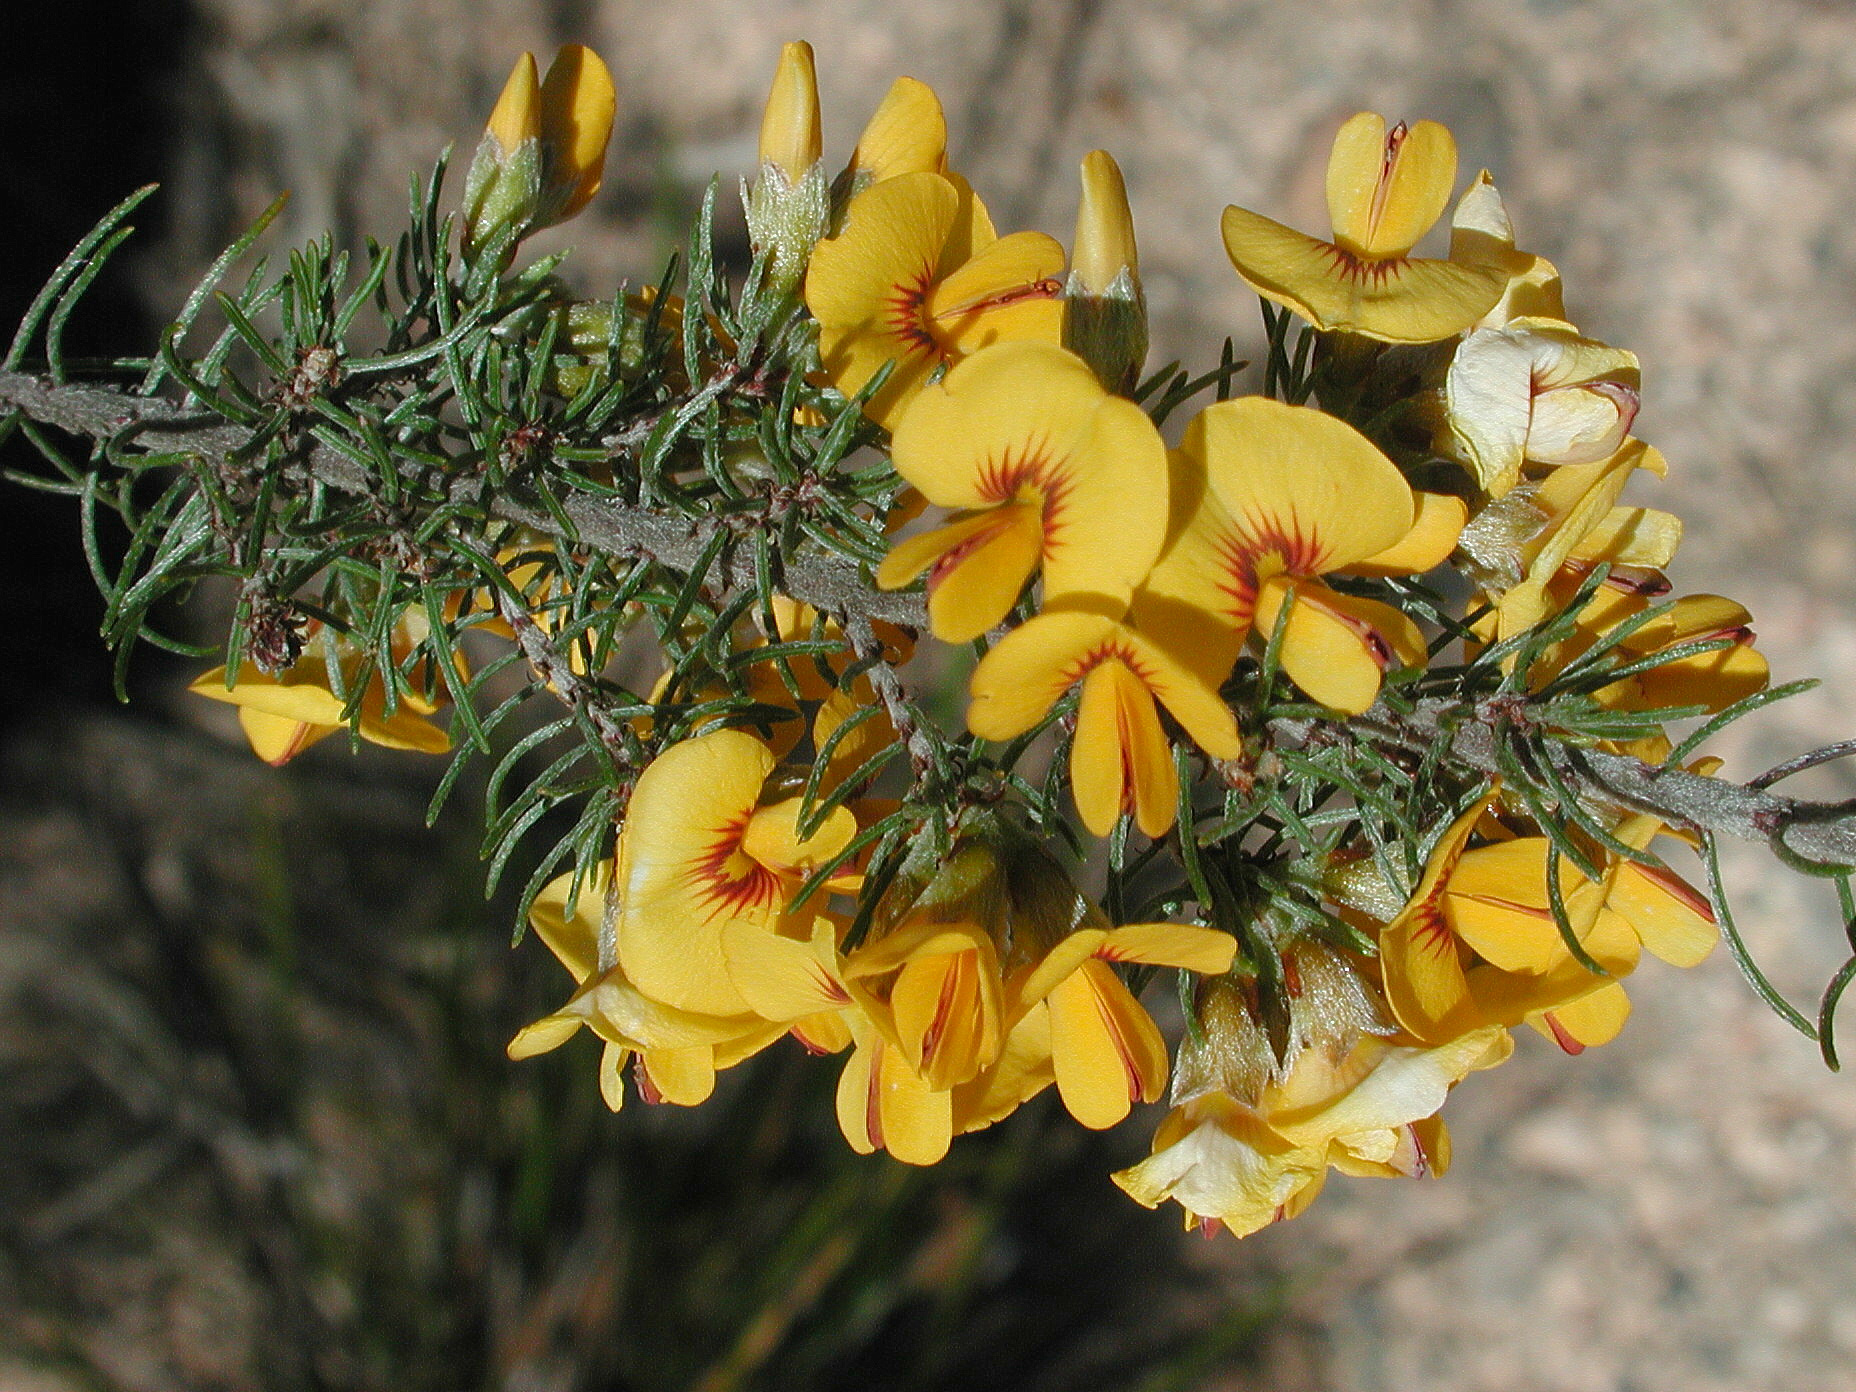 Pultenaea mollis